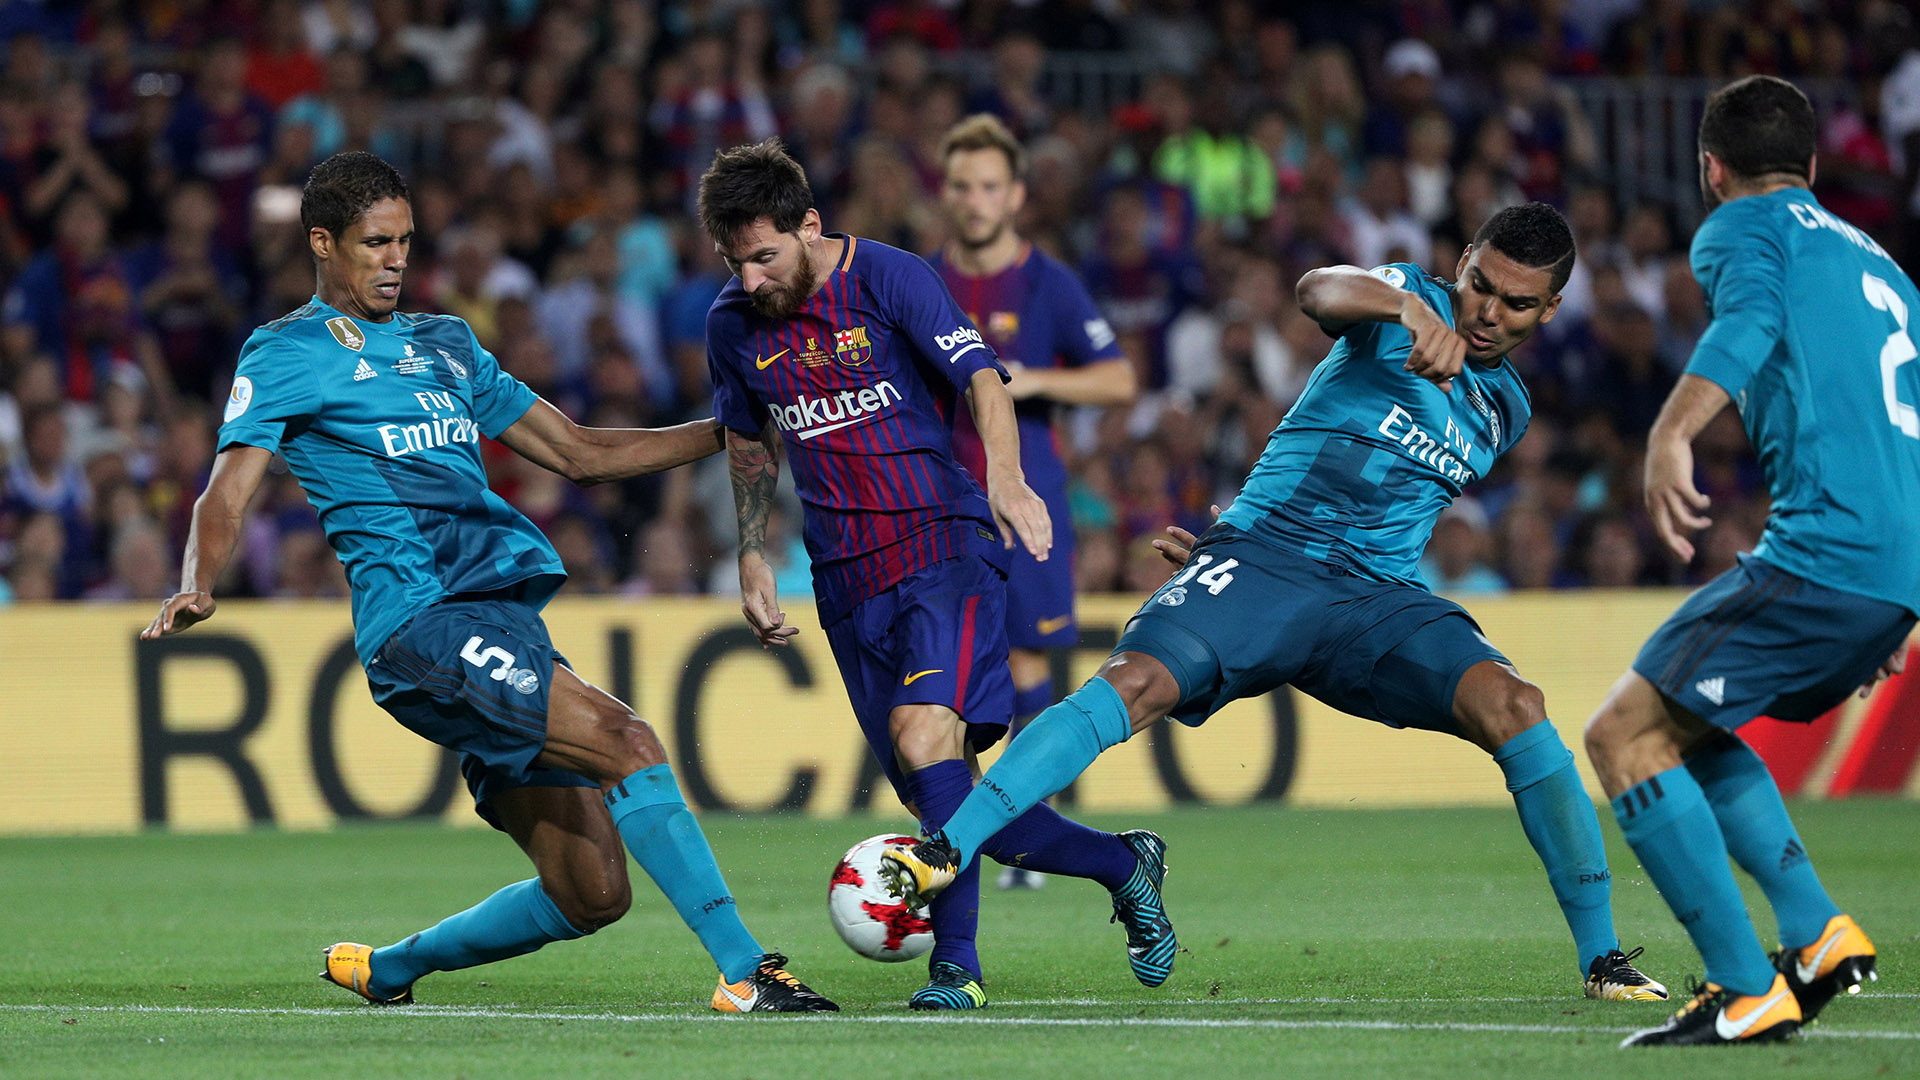 [ Internacional ] Cristiano Ronaldo le tocó la oreja a Lio Messi